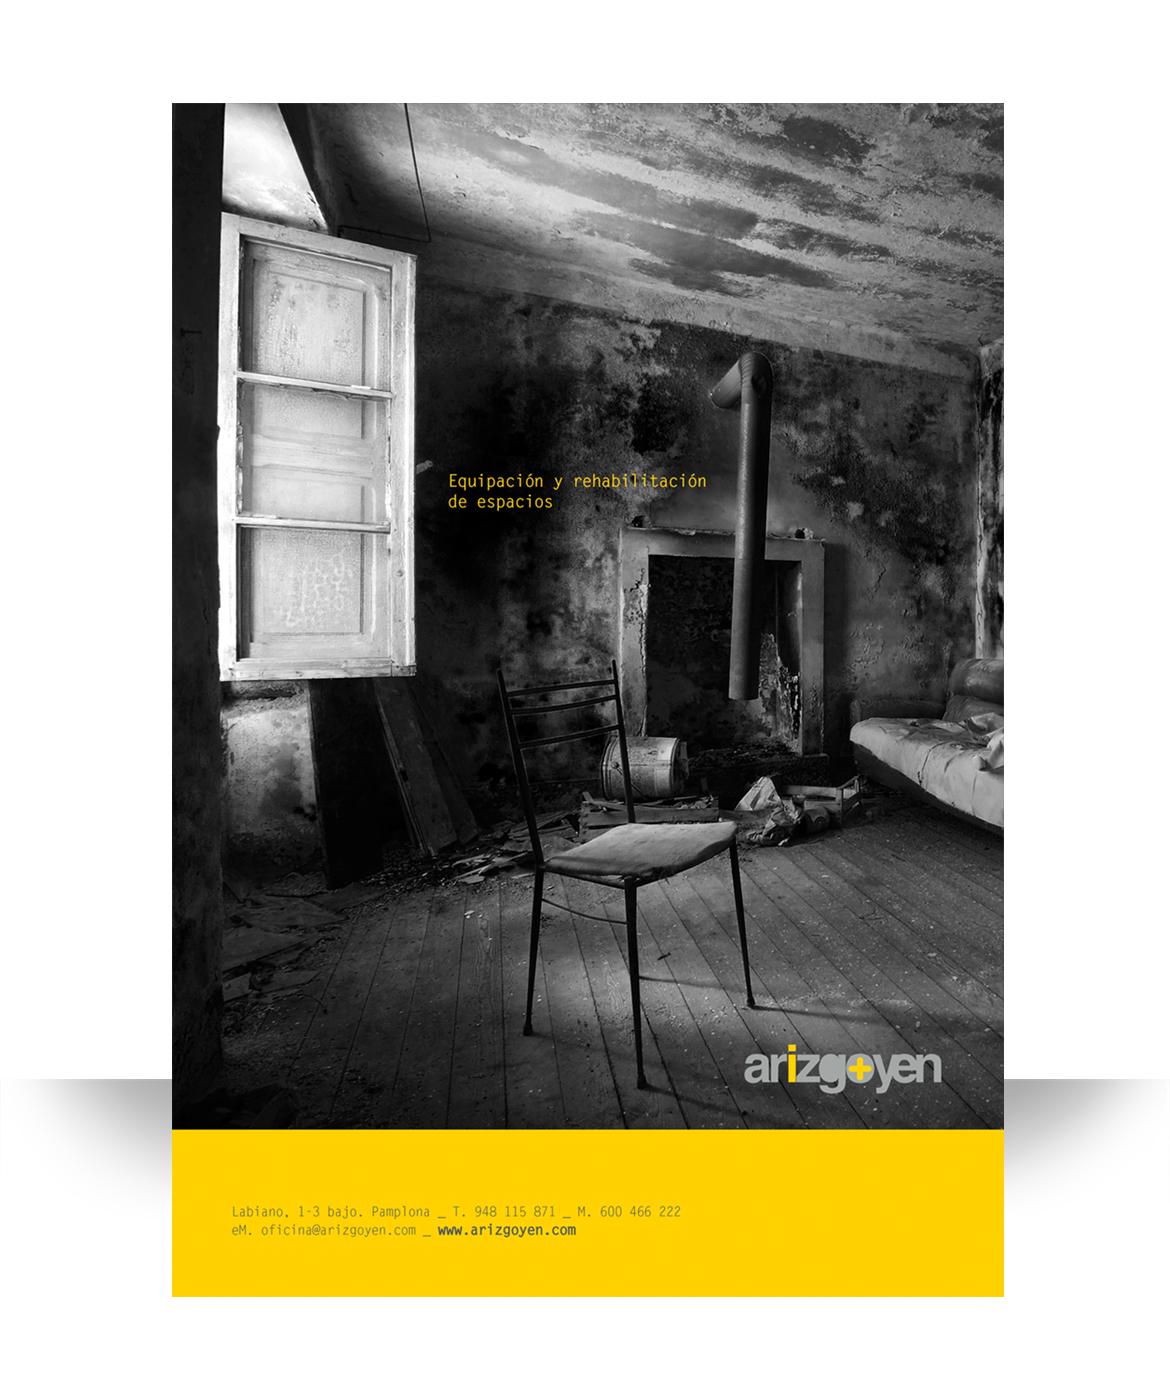 publicidad pamplona Arizgoyen reformas